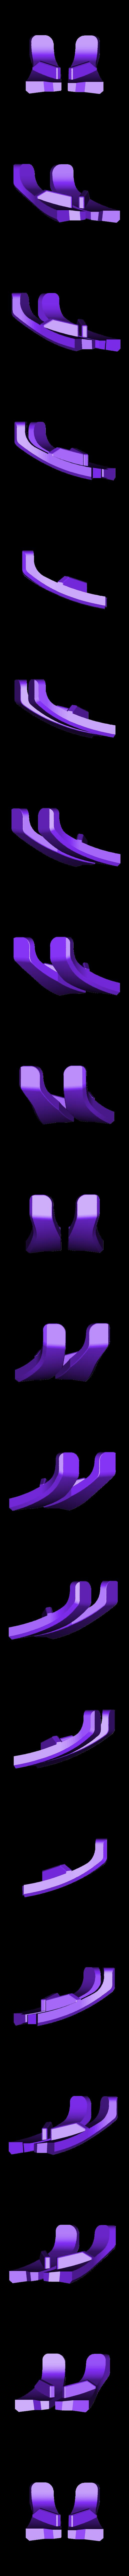 32_Drag_Waist5_Side2_GREEN.stl Download STL file ARTICULATED DRAGONLORD (not Dragonzord) - NO SUPPORT • 3D printer model, Toymakr3D